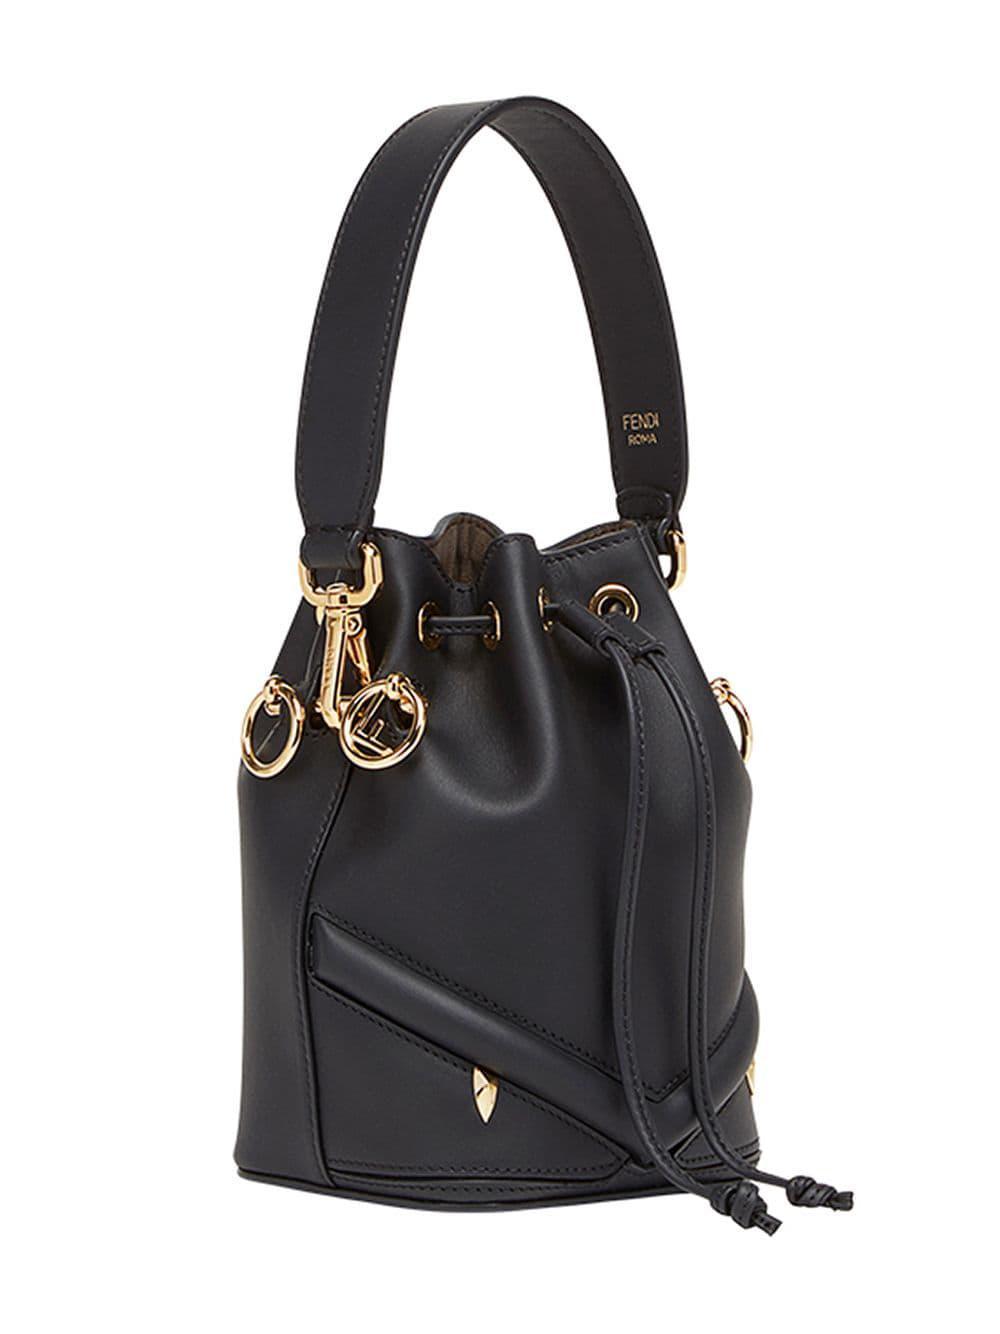 dfa9fbfeb326 Lyst - Fendi Mini Mon Tresor Bag in Black